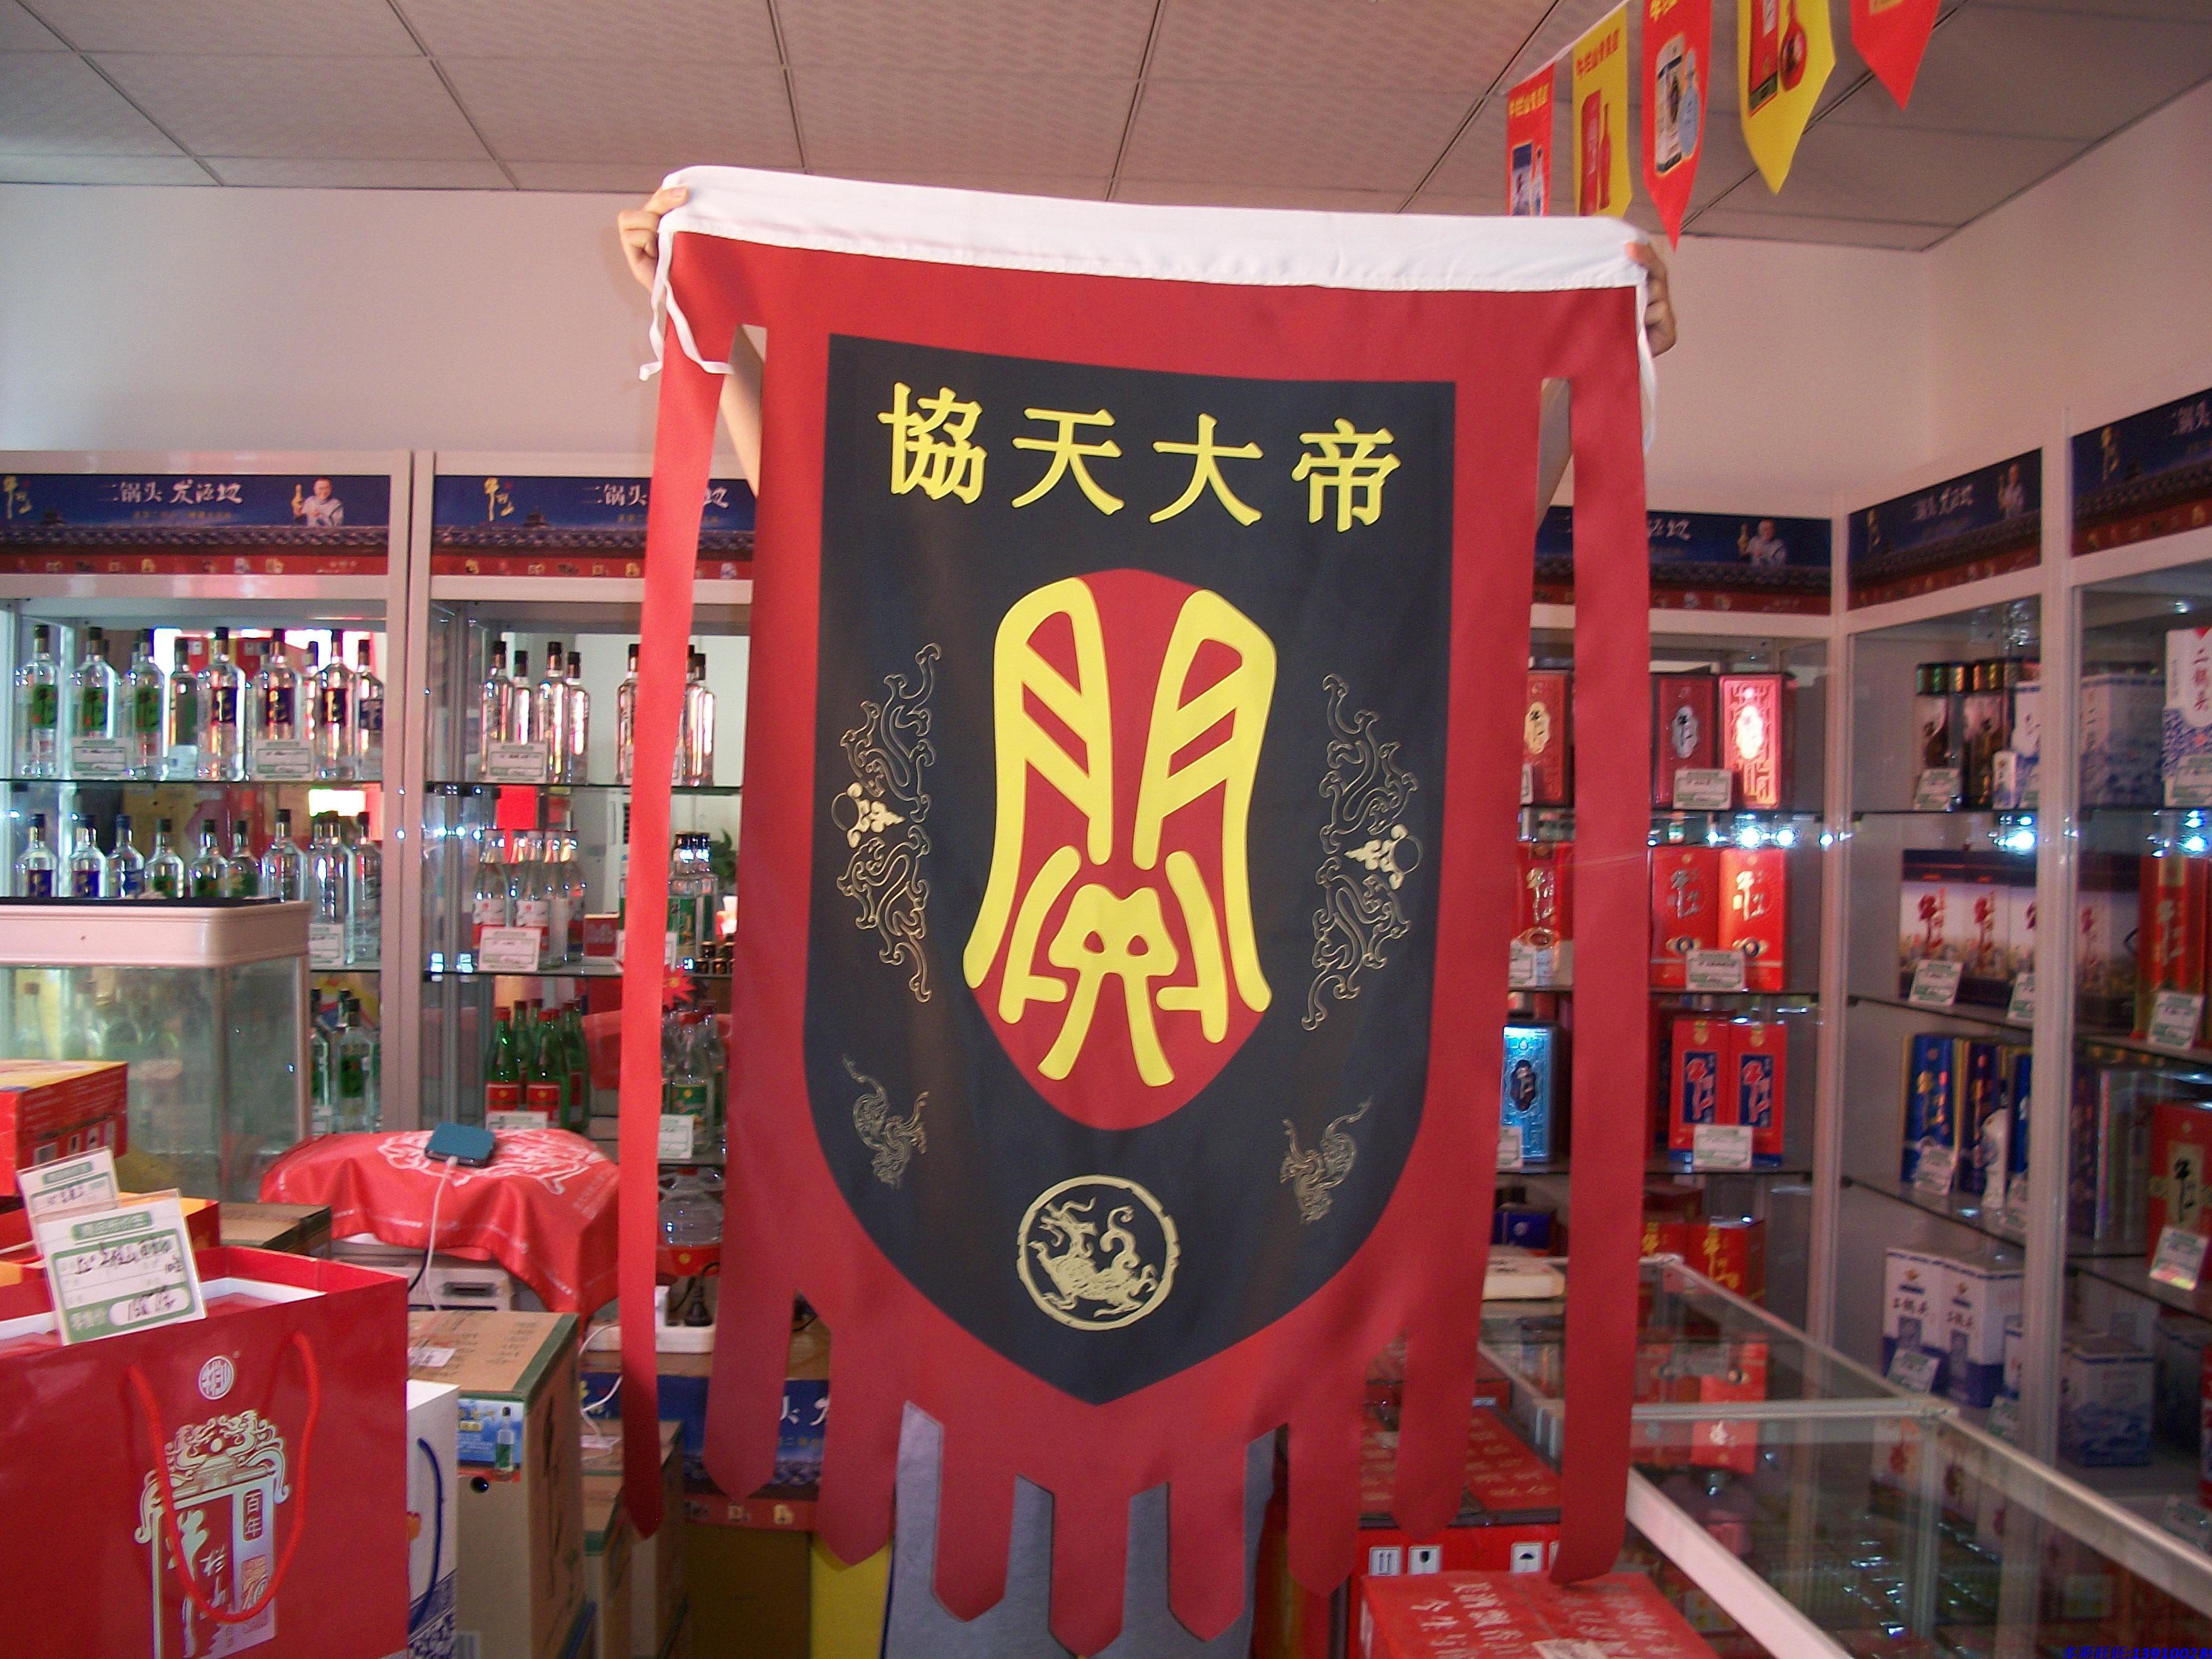 Флаг Античный флаги, баннеры, jiuqi, shuaiqi, можно установить флаг флагов, полумесяц Луны, пламя, размер